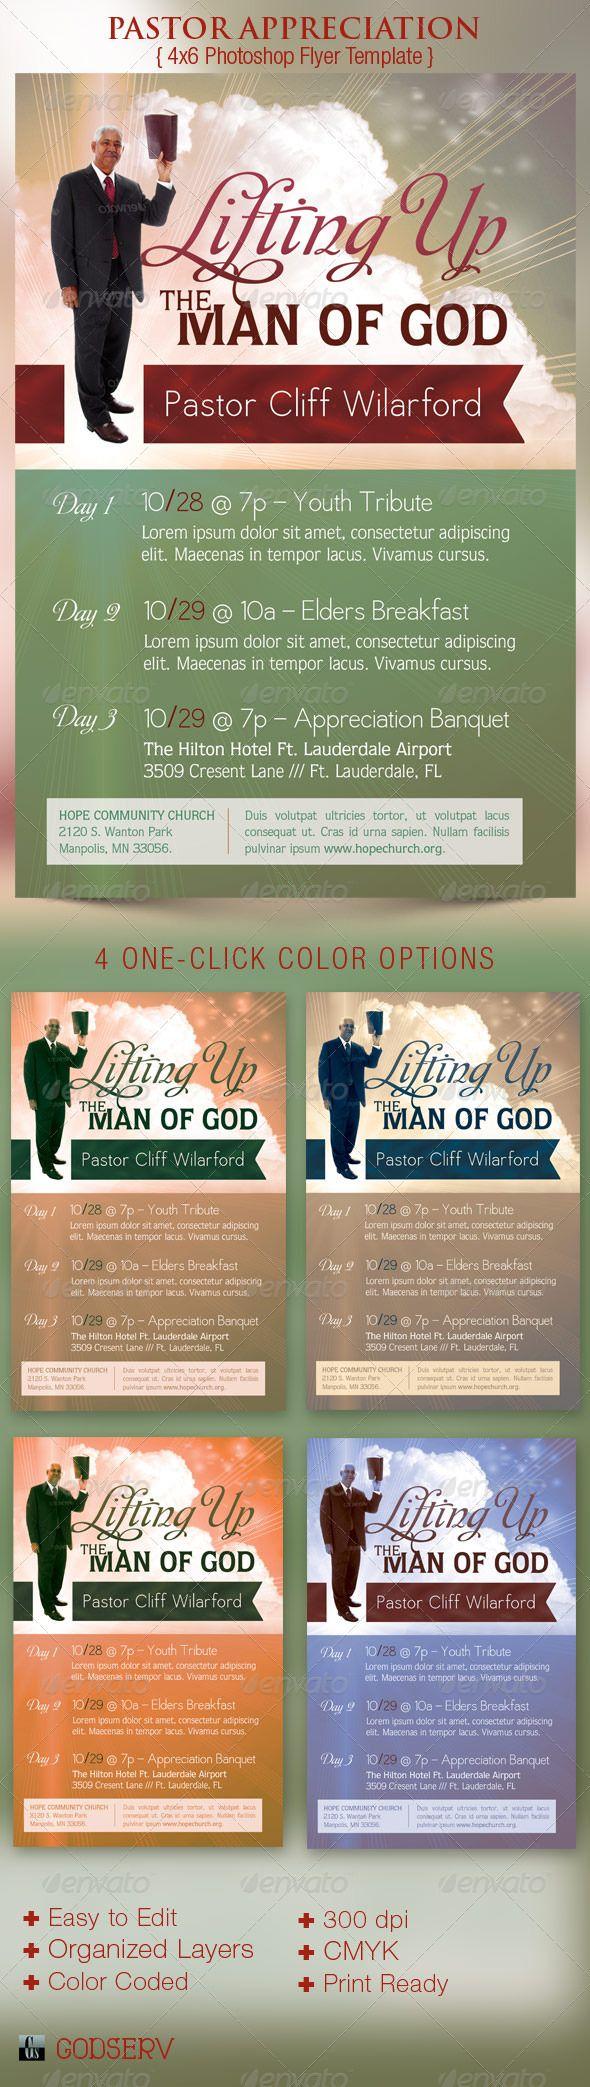 best ideas about christian flyer christian pastor appreciation church flyer template